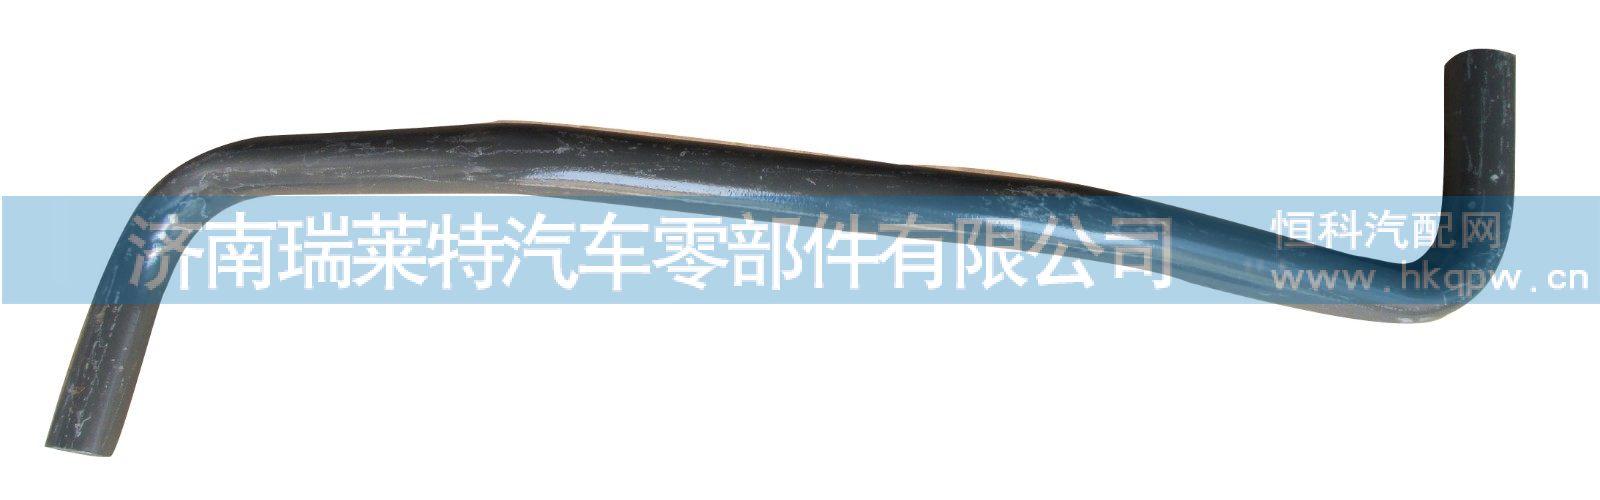 70KZJL 70矿车 变速箱支架梁/